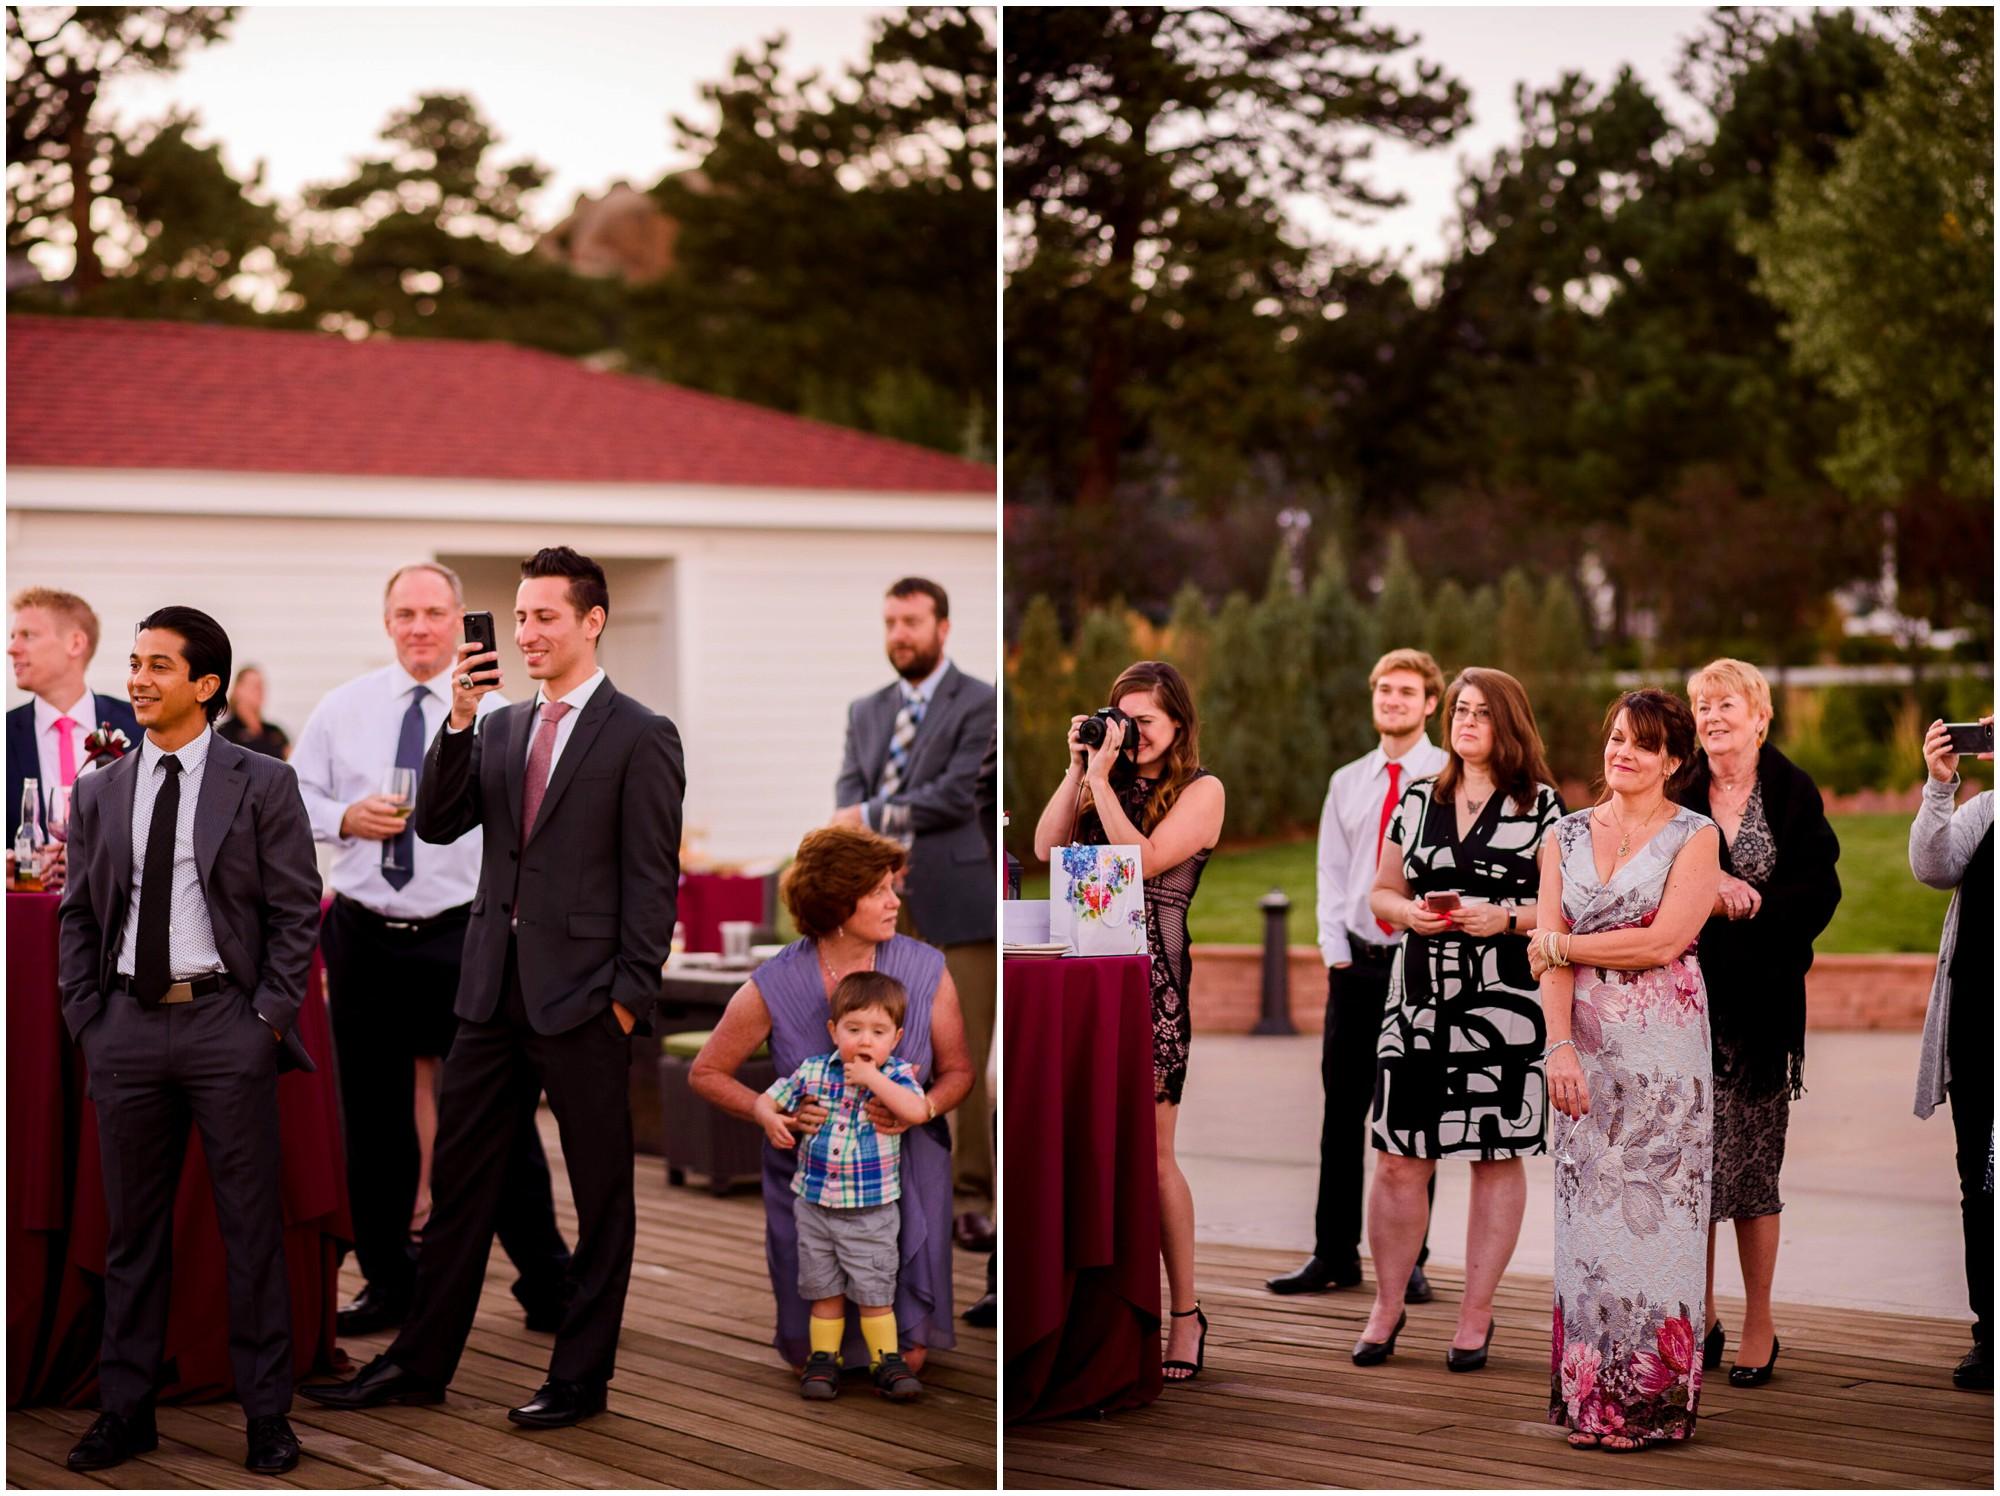 190-Estes-Park-Stanley-hotel-fall-wedding.jpg